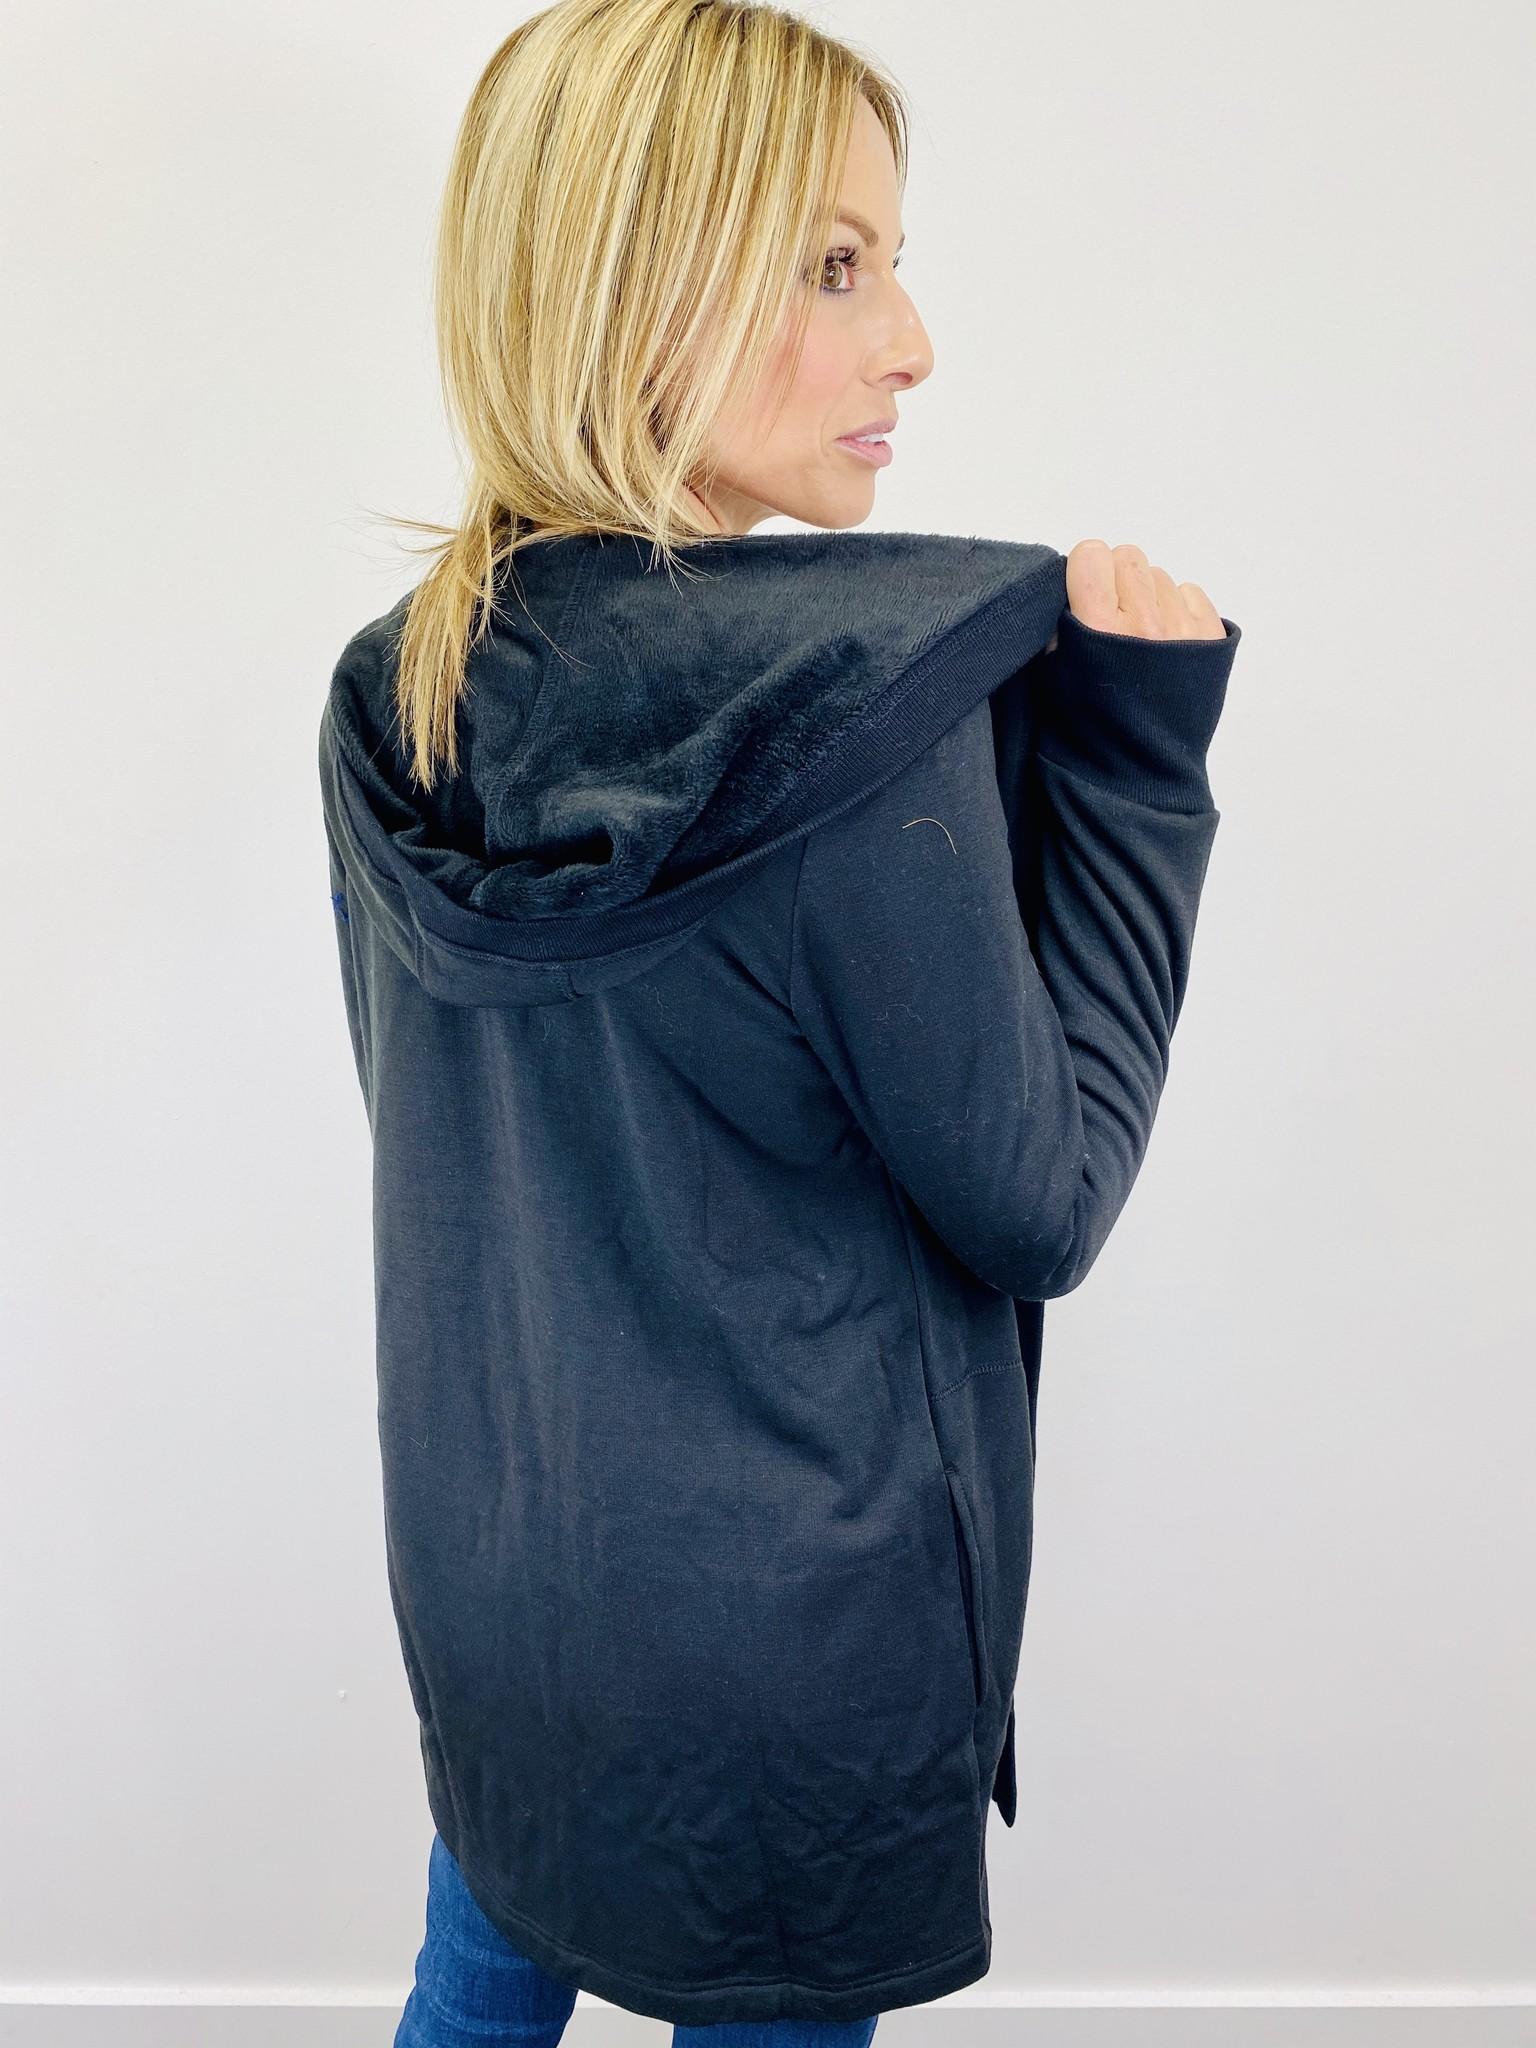 Hem & Thread Hooded Fleece Cardigan in Black